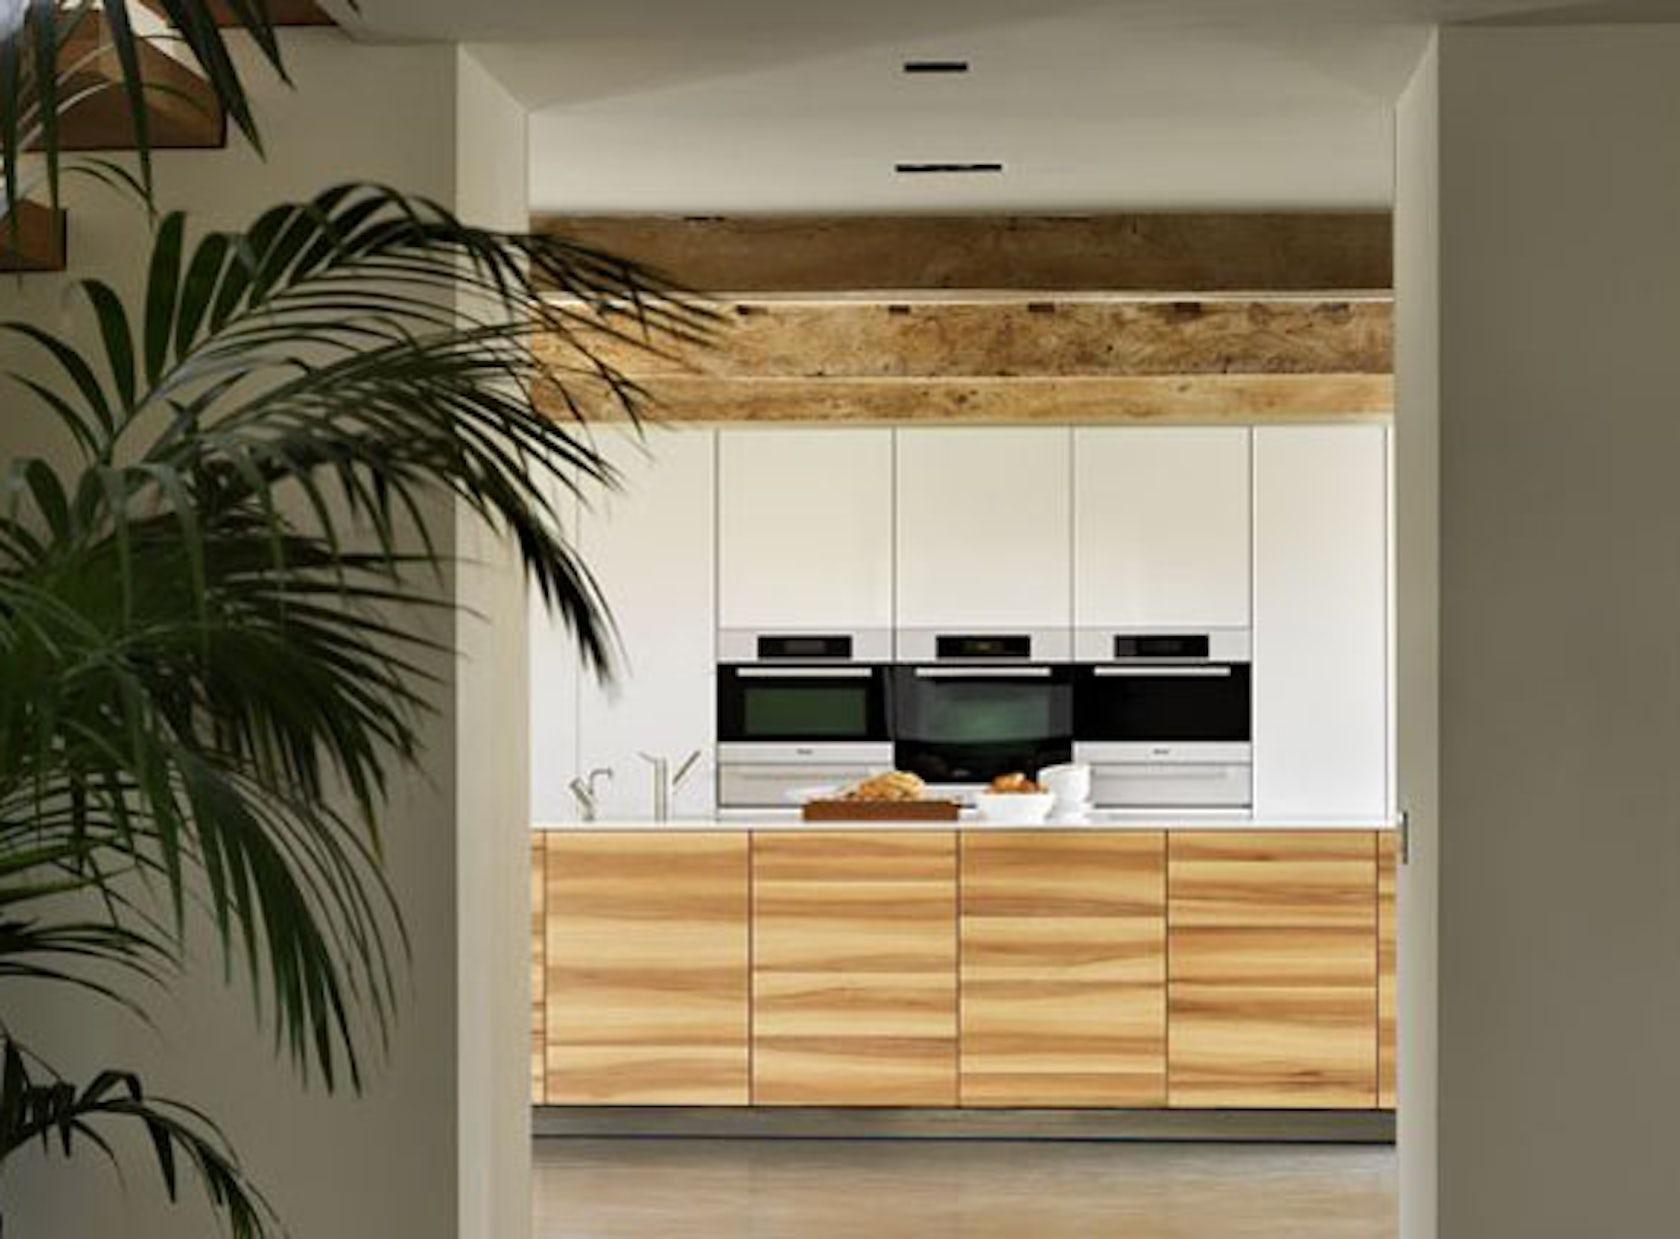 Barn Conversion Kitchen Architecture S Bulthaup B3 On Architizer